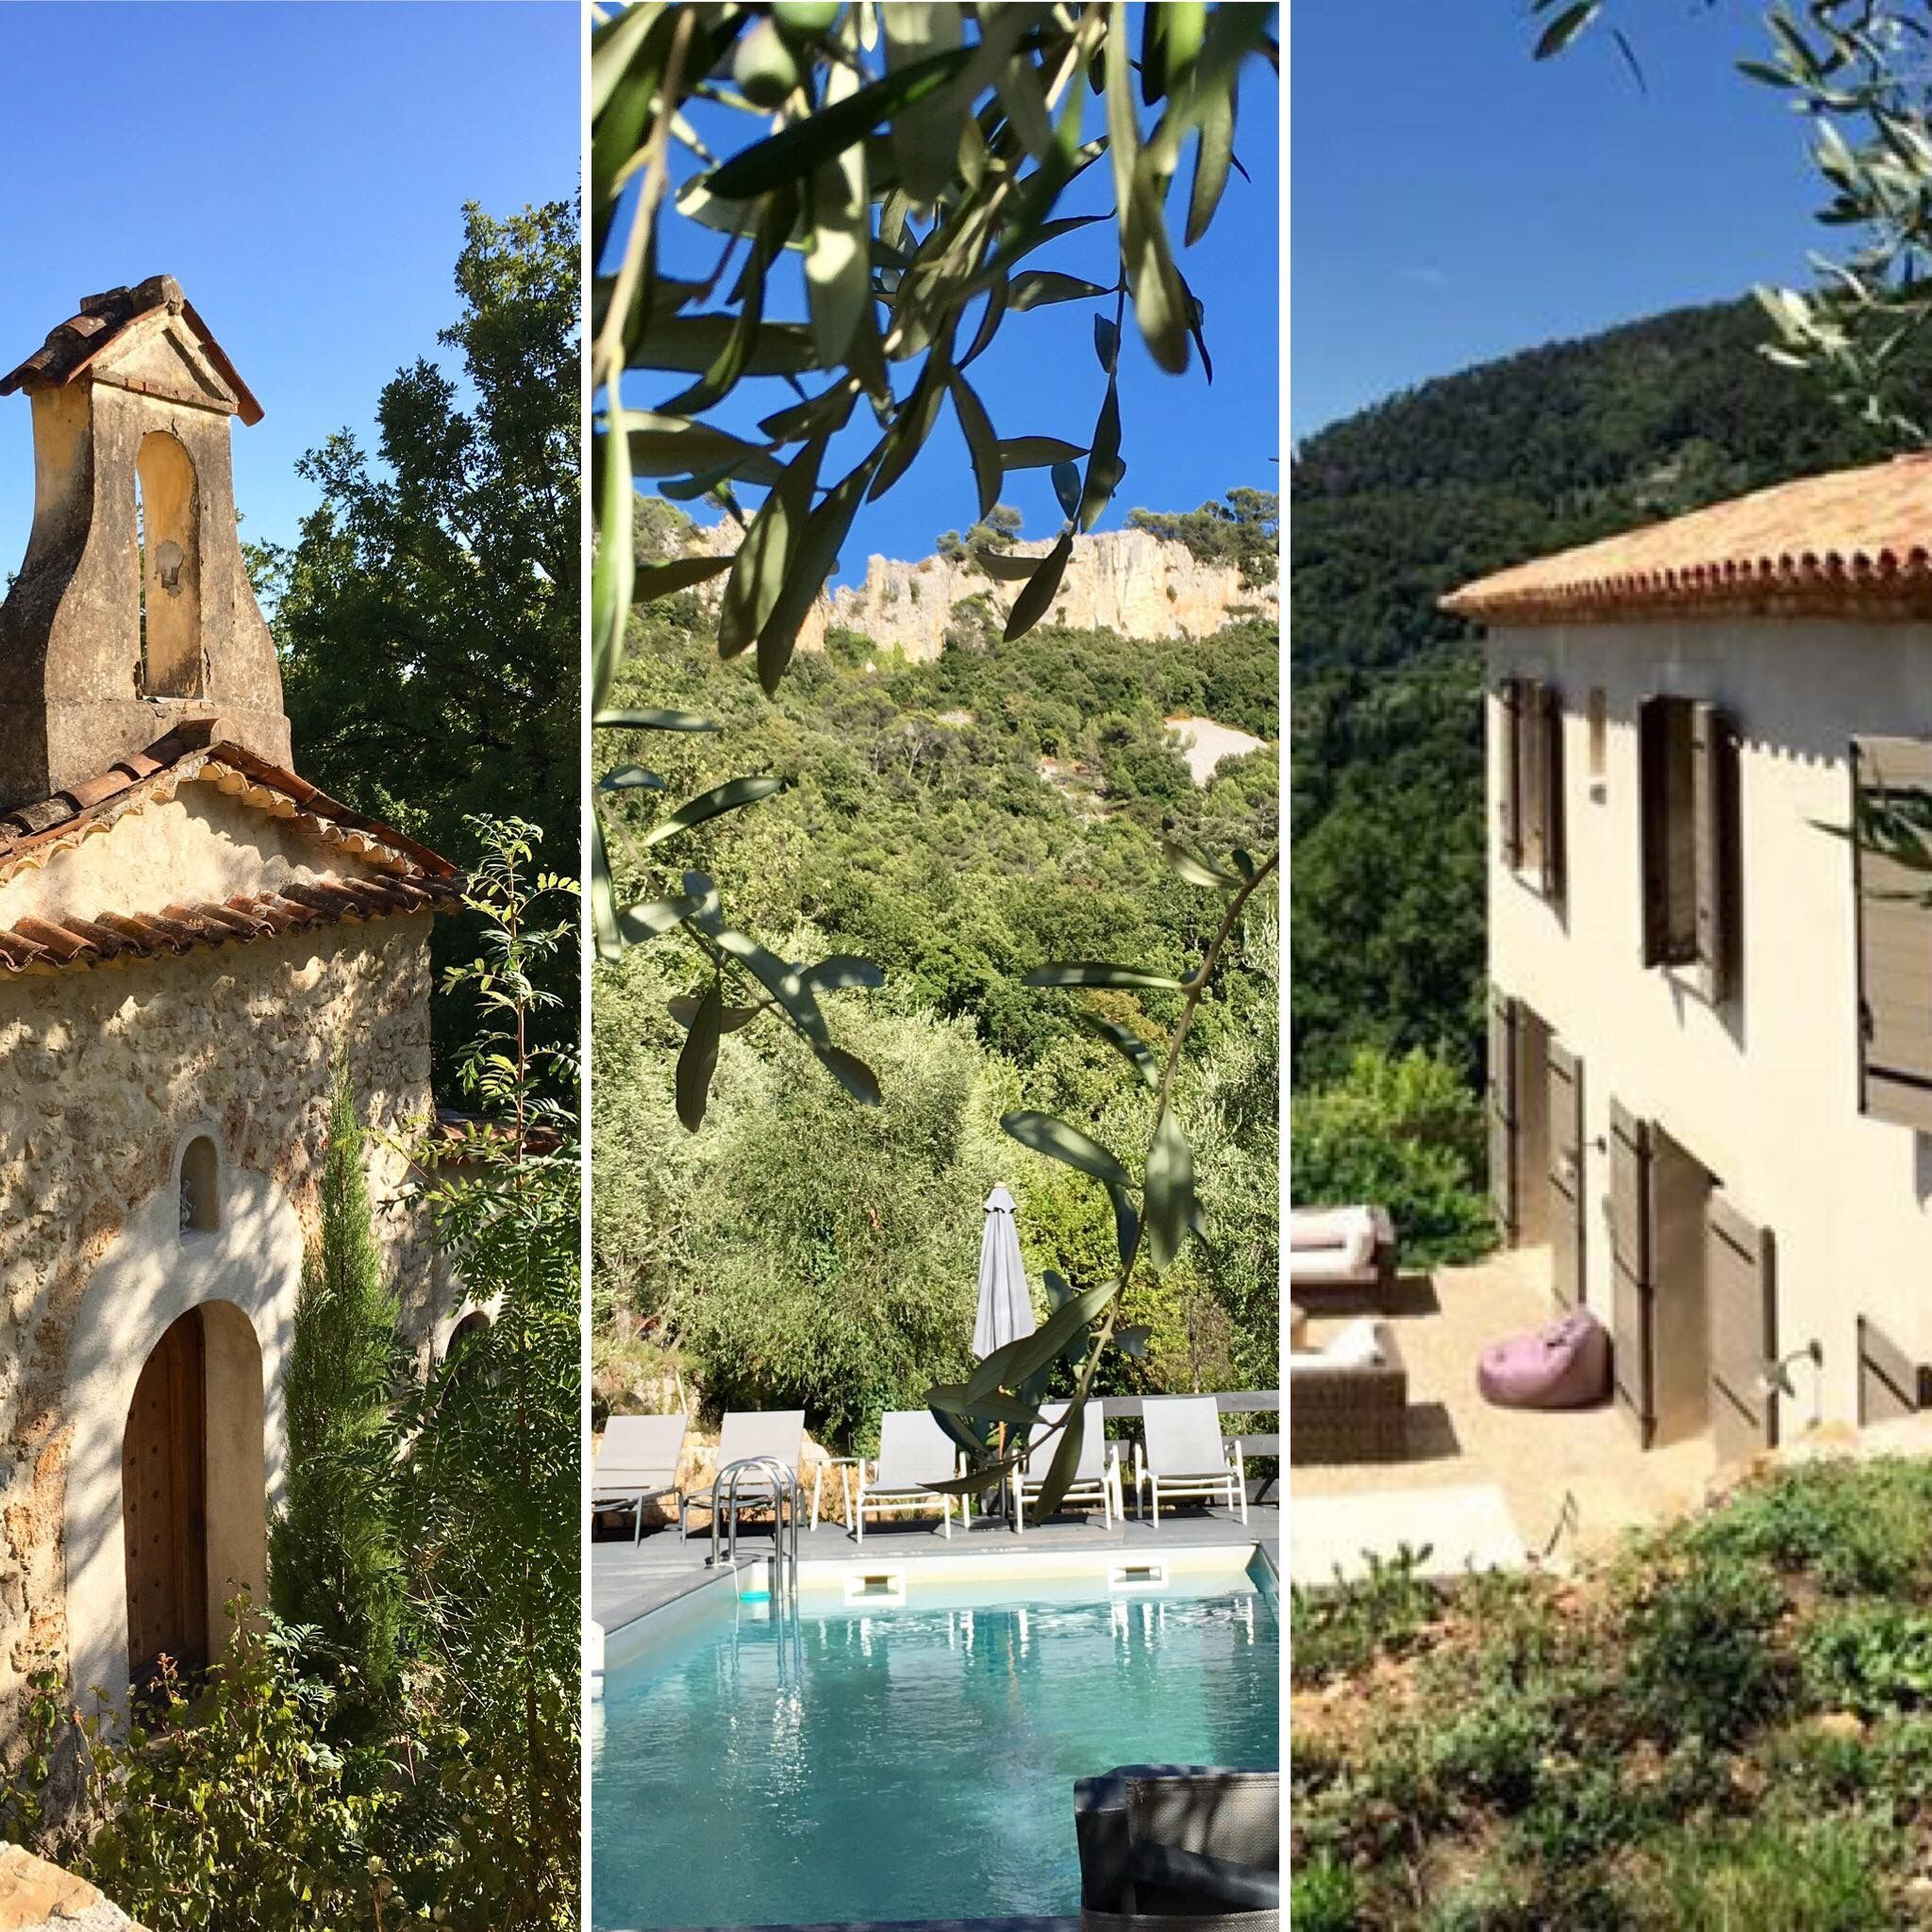 Impressionnant Chambre D Hote Provence Artamplitude